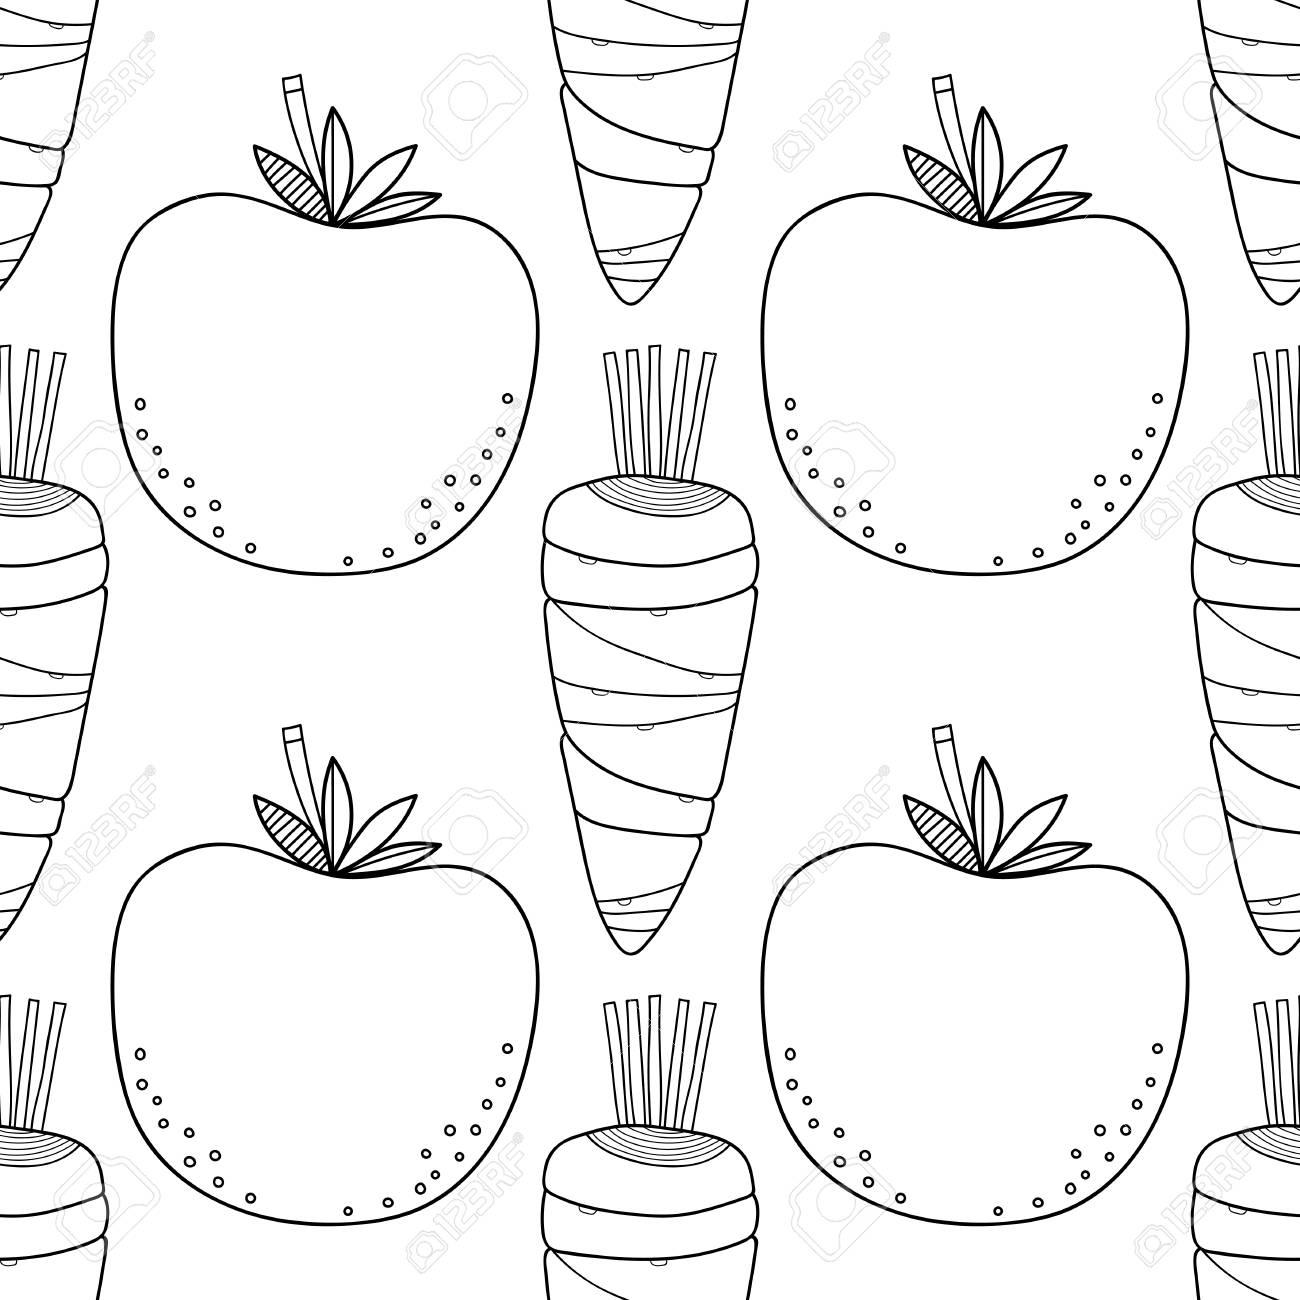 Patrón Transparente Vegetal Negro Blanco Con Tomates Zanahorias Para Colorear